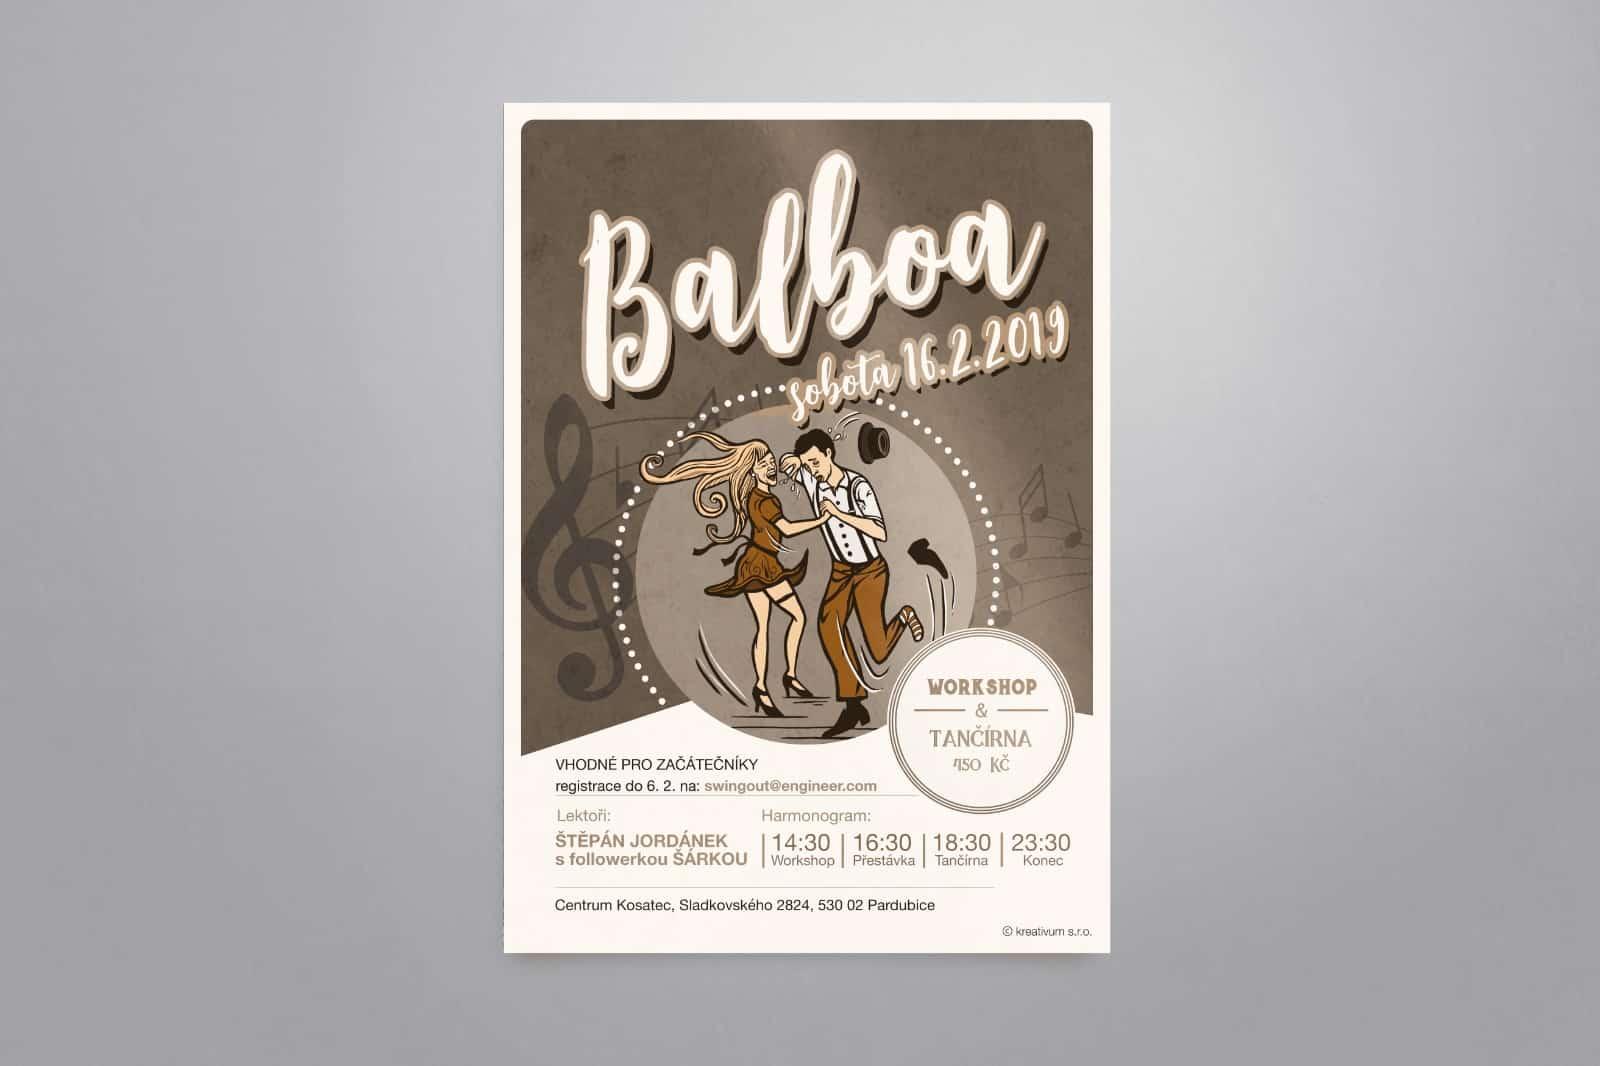 balboa_poster.jpeg